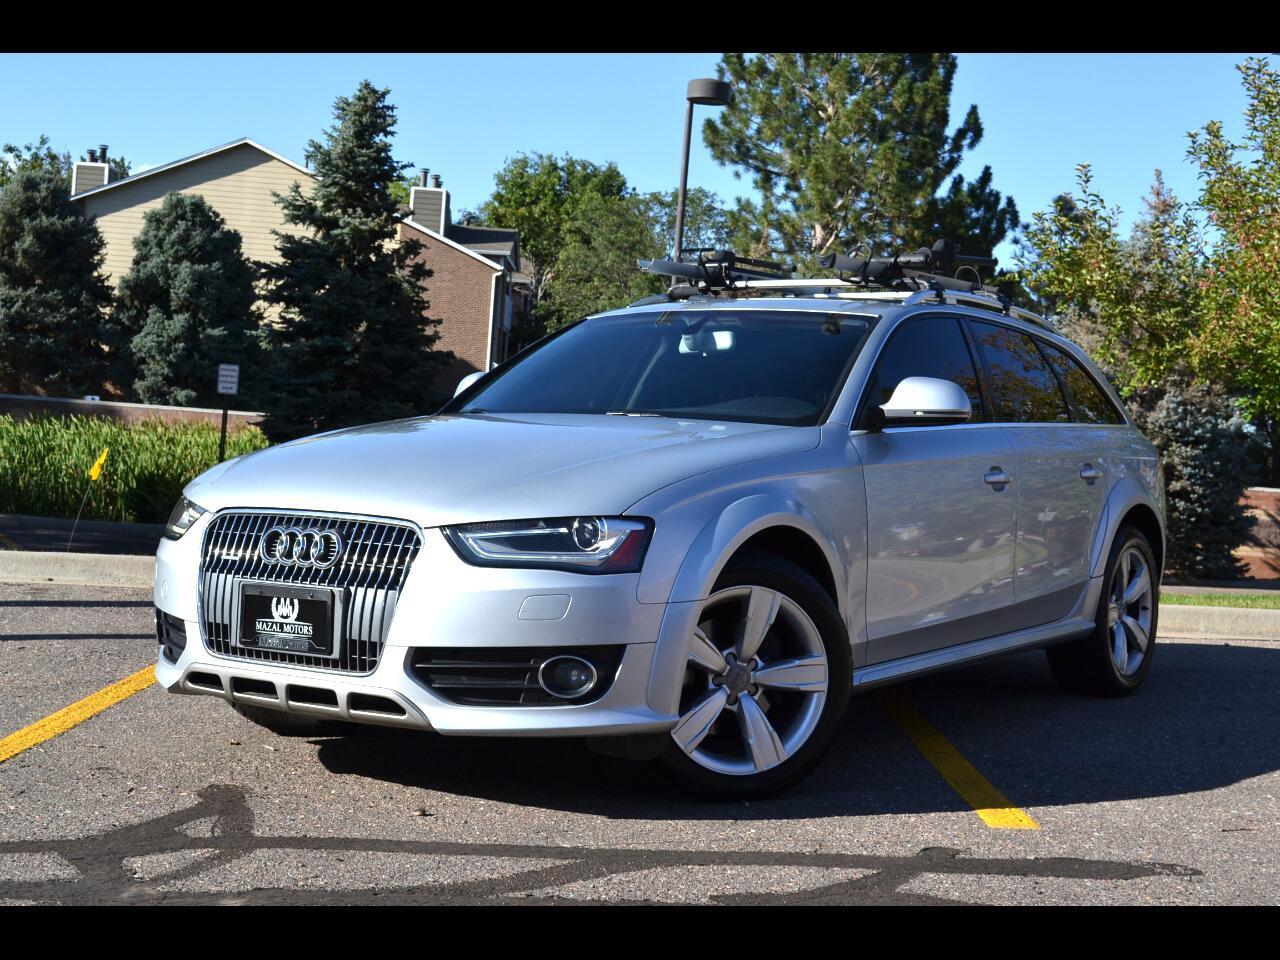 Audi allroad 4dr Wgn Premium 2013